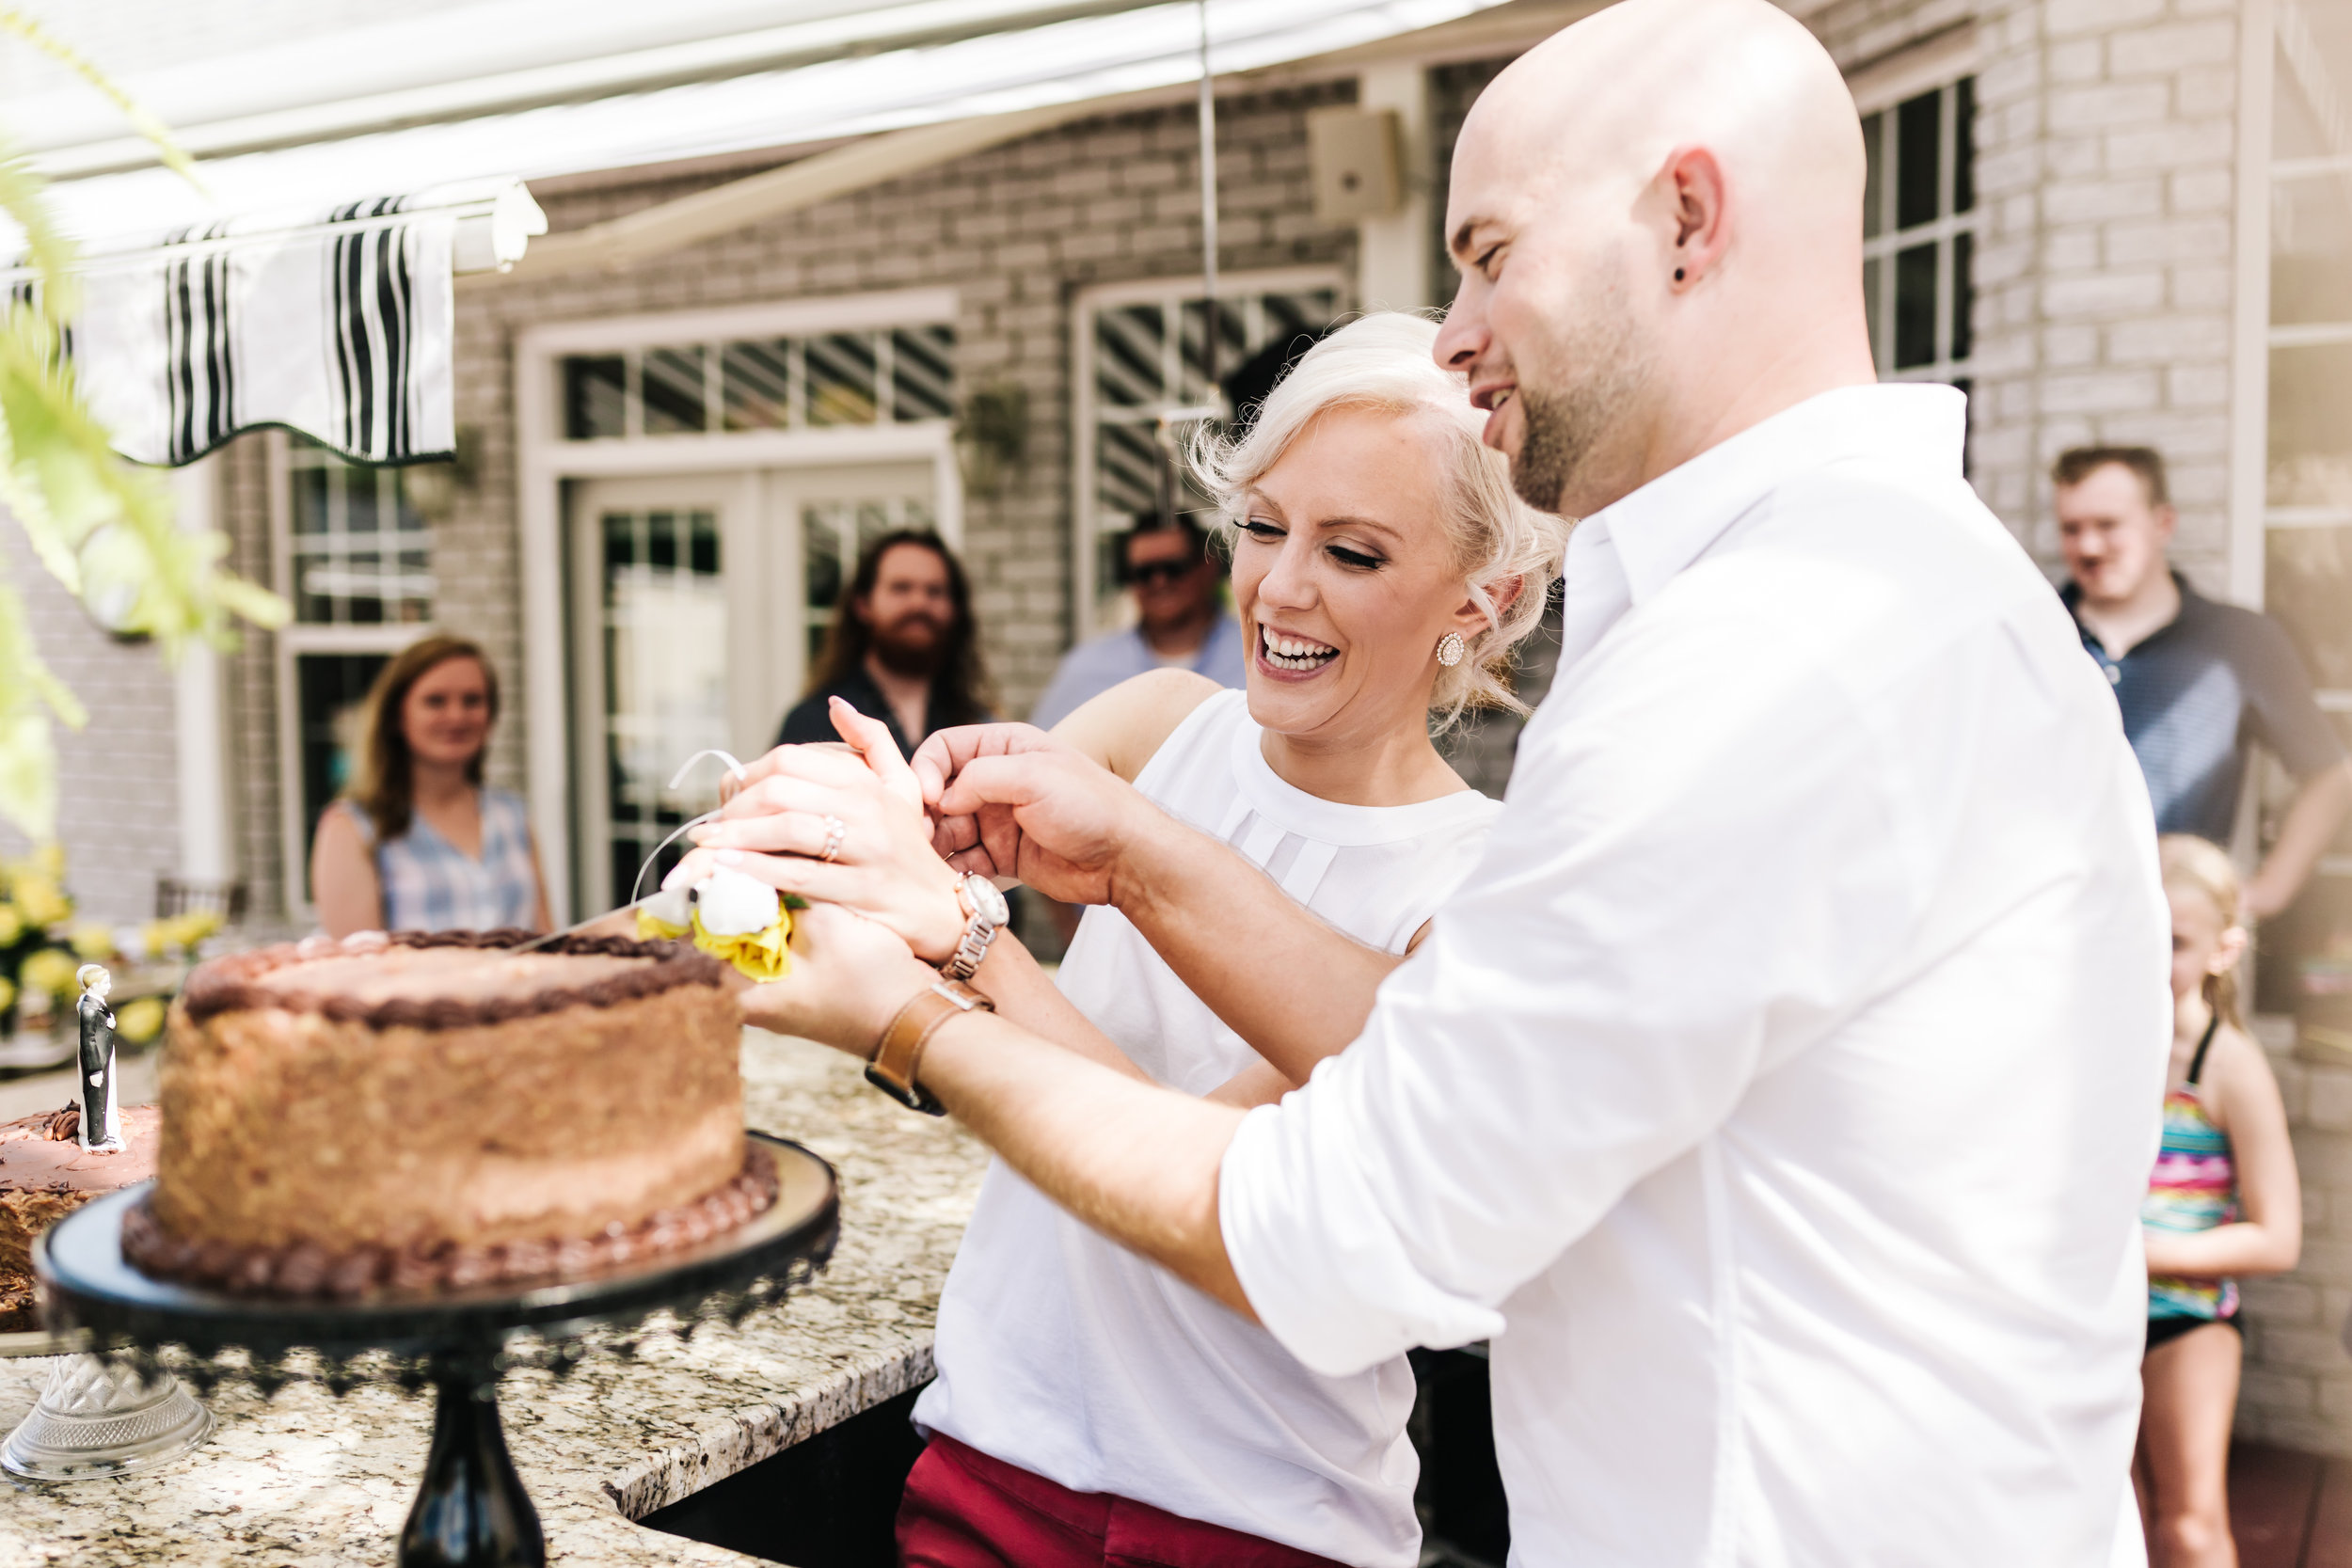 2018.09.02 Ray and Sarah Prizner Nashville TN Wedding FINALS-501.jpg